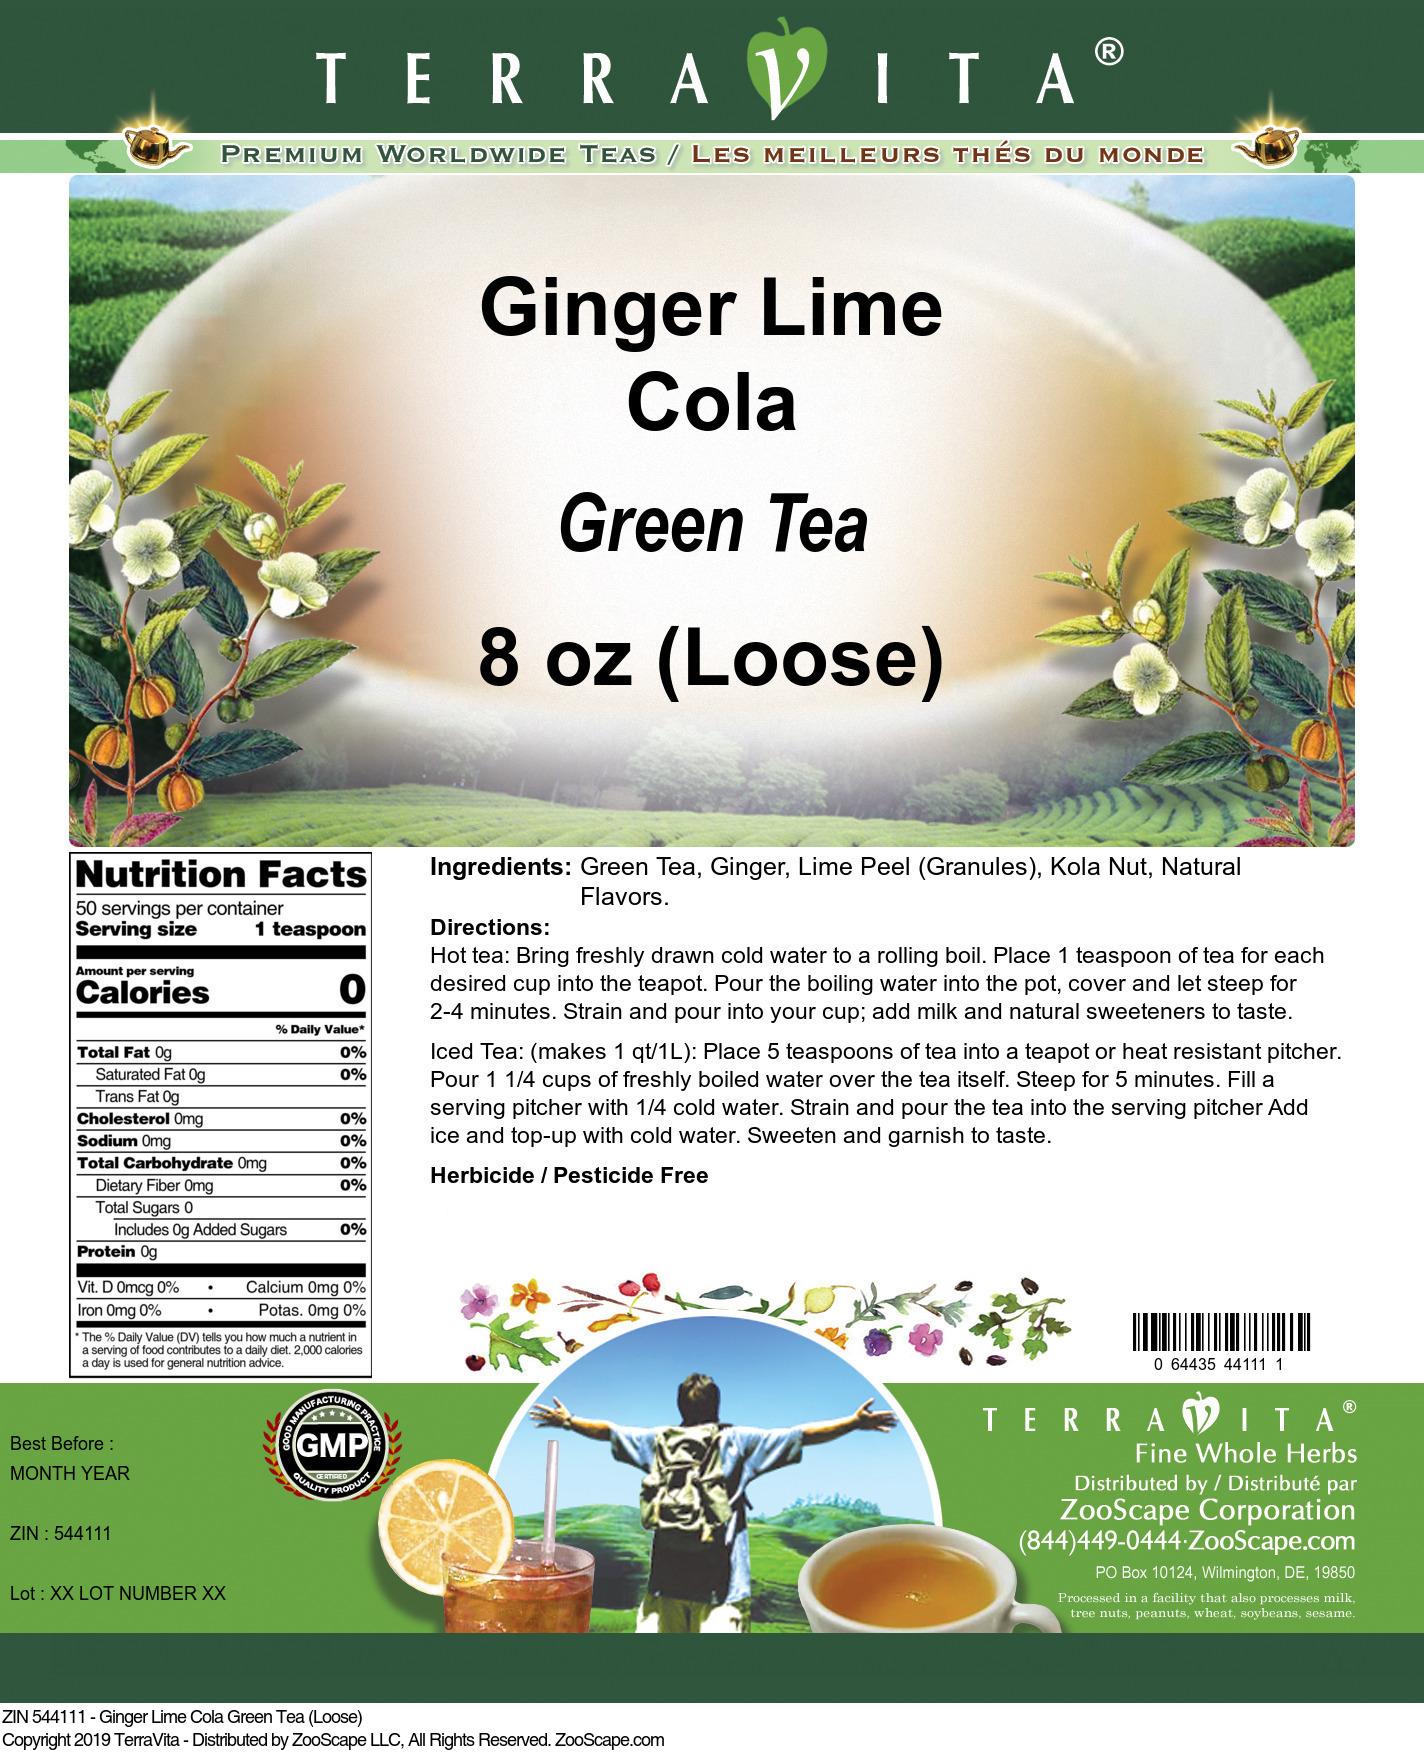 Ginger Lime Cola Green Tea (Loose)